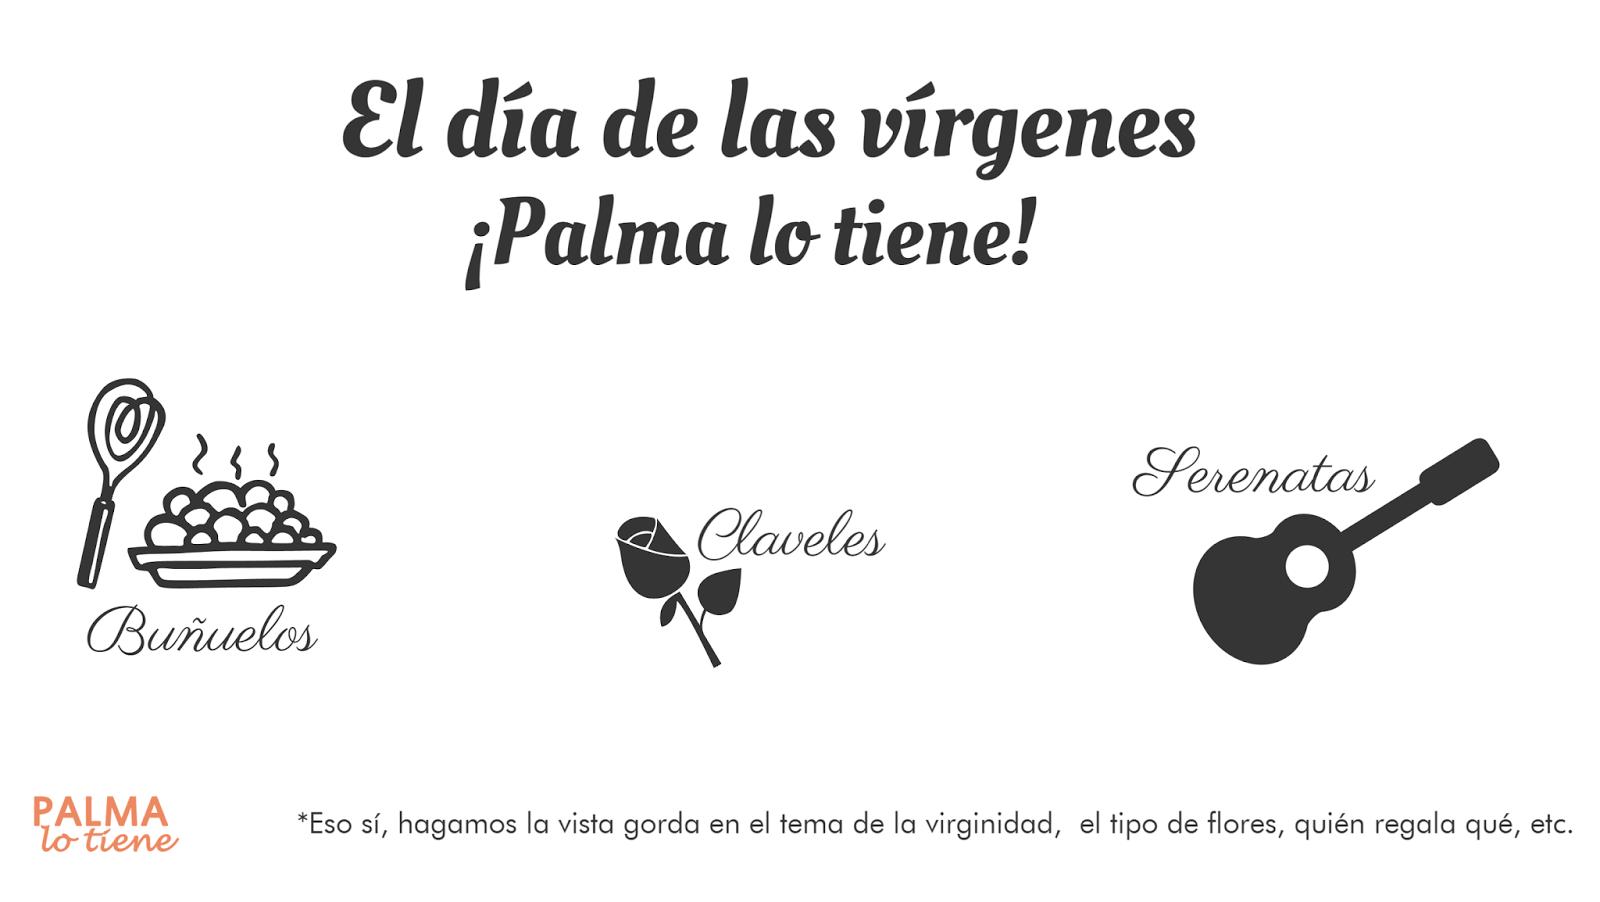 http://palmalotiene.blogspot.com.es/2013/10/el-dia-de-las-virgenes.html